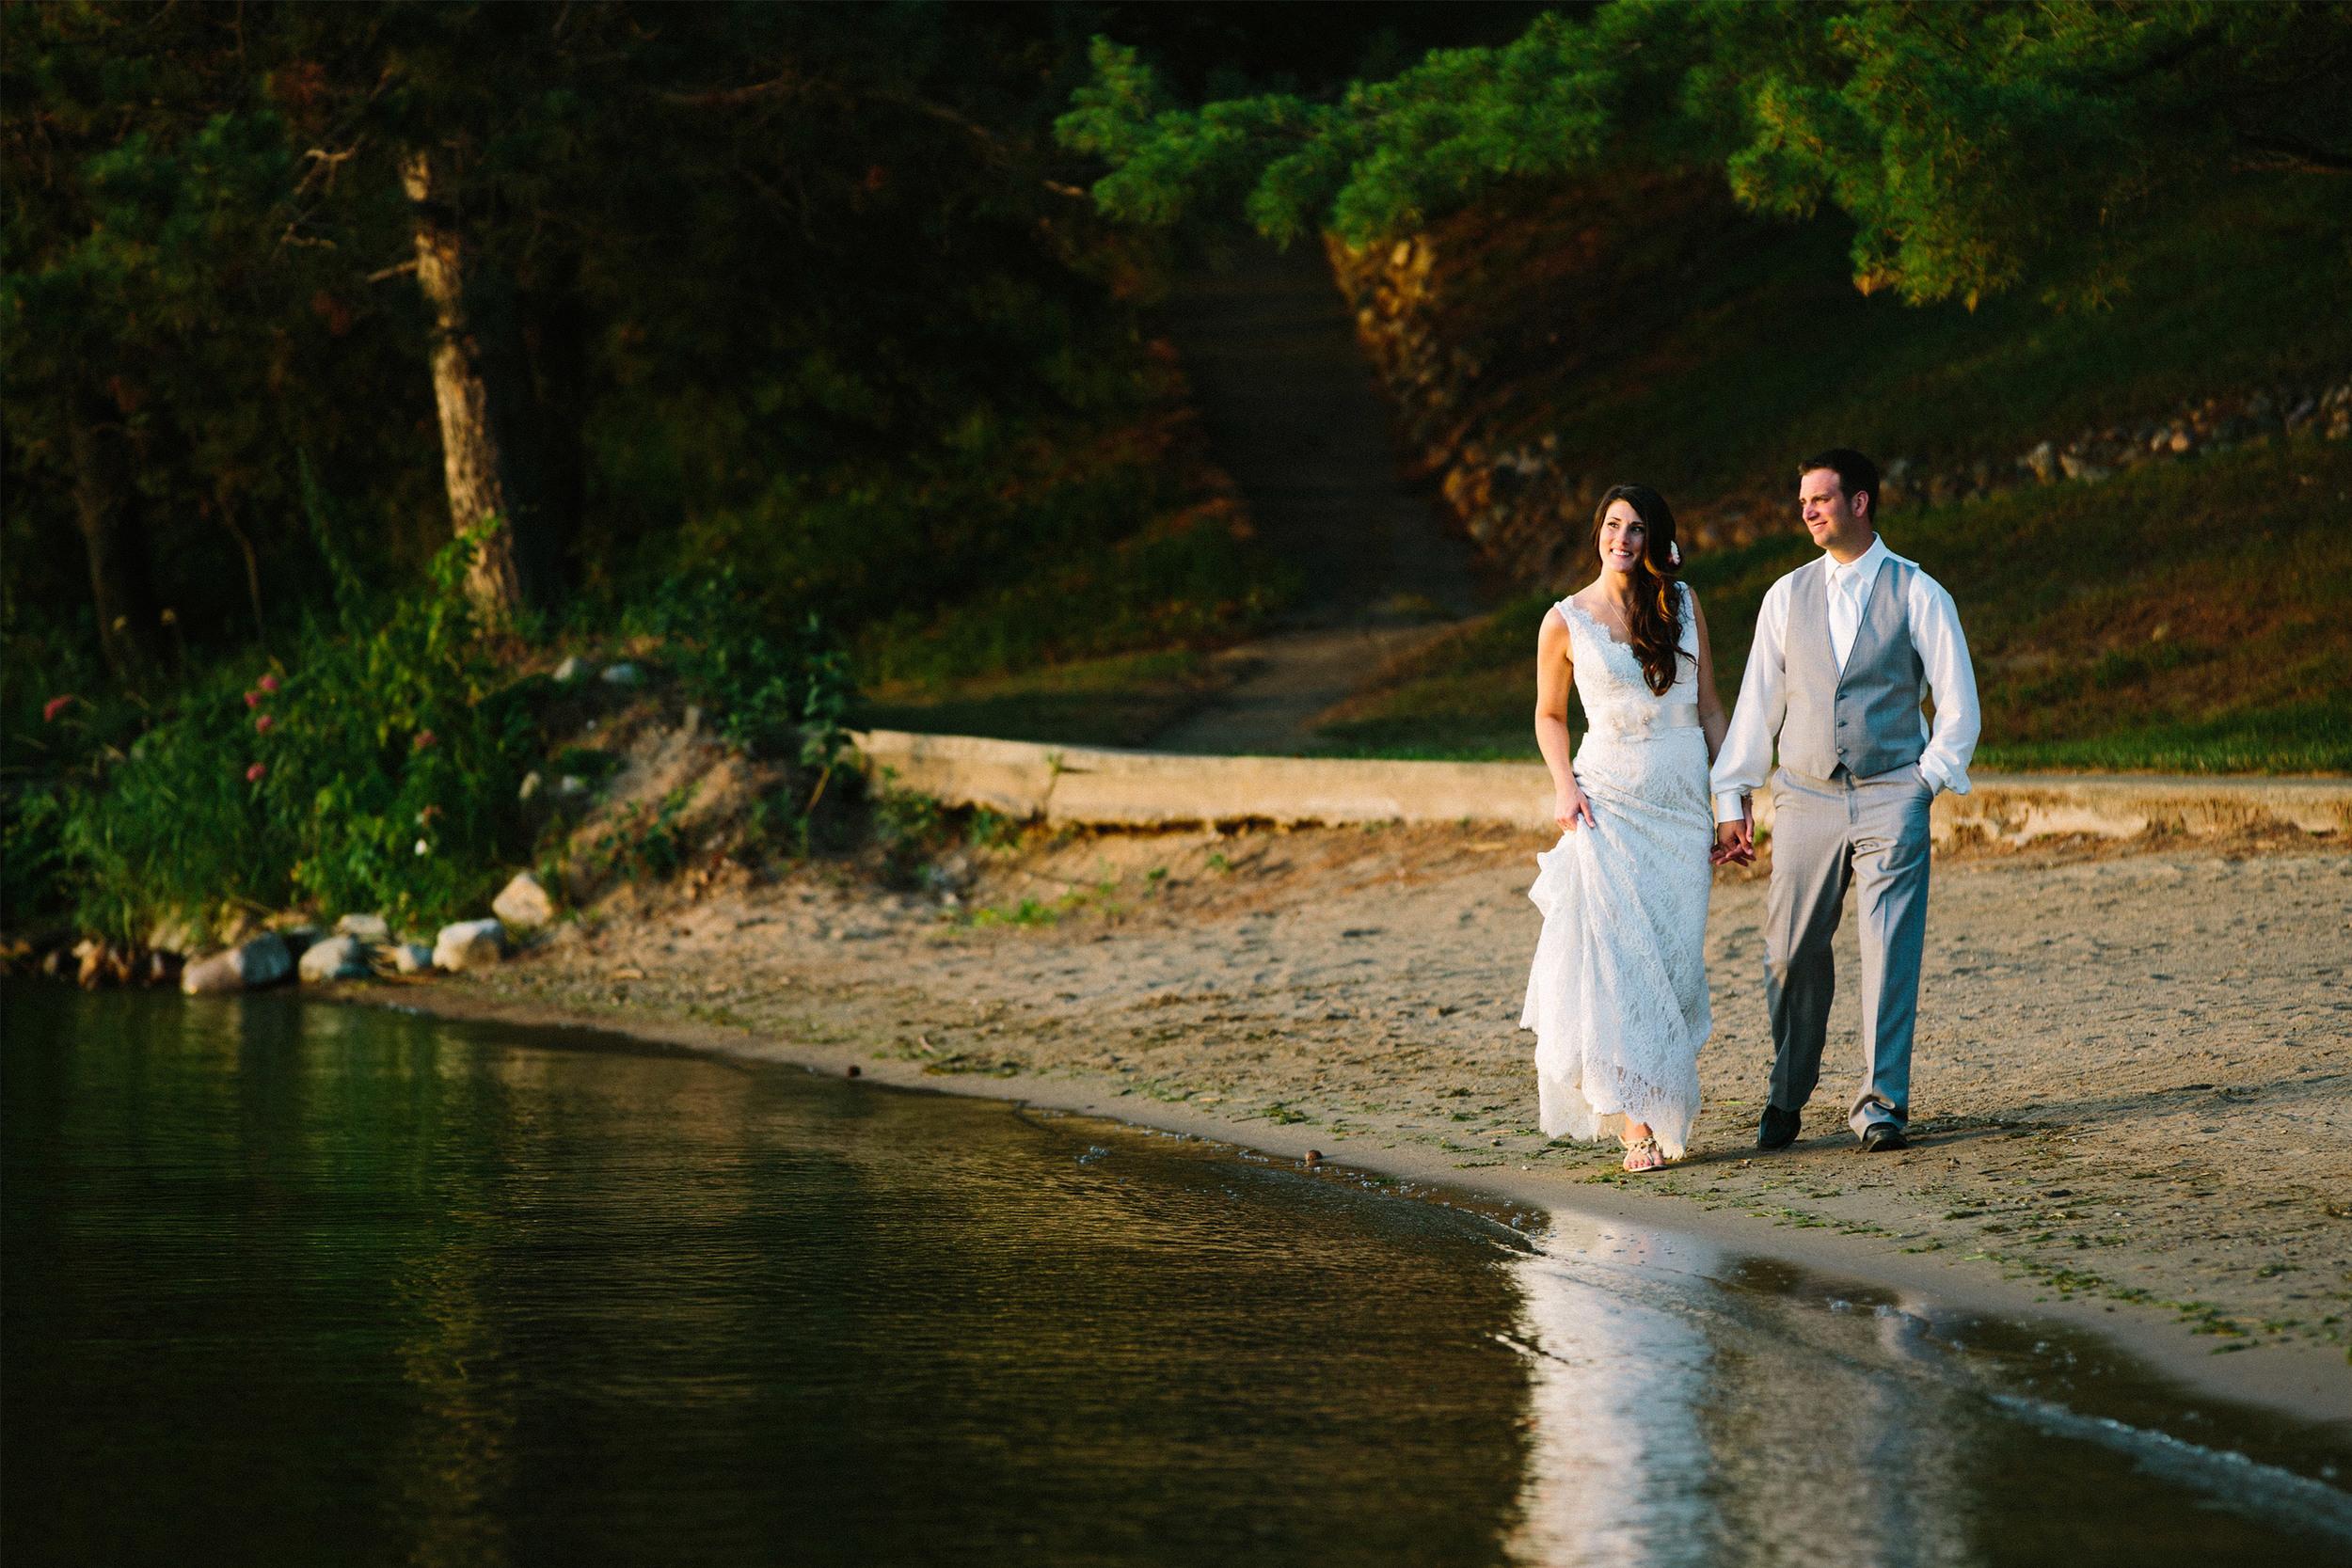 54-Maddens_Resort_Wedding_Wilson_Bay_Gull_Lake.jpg